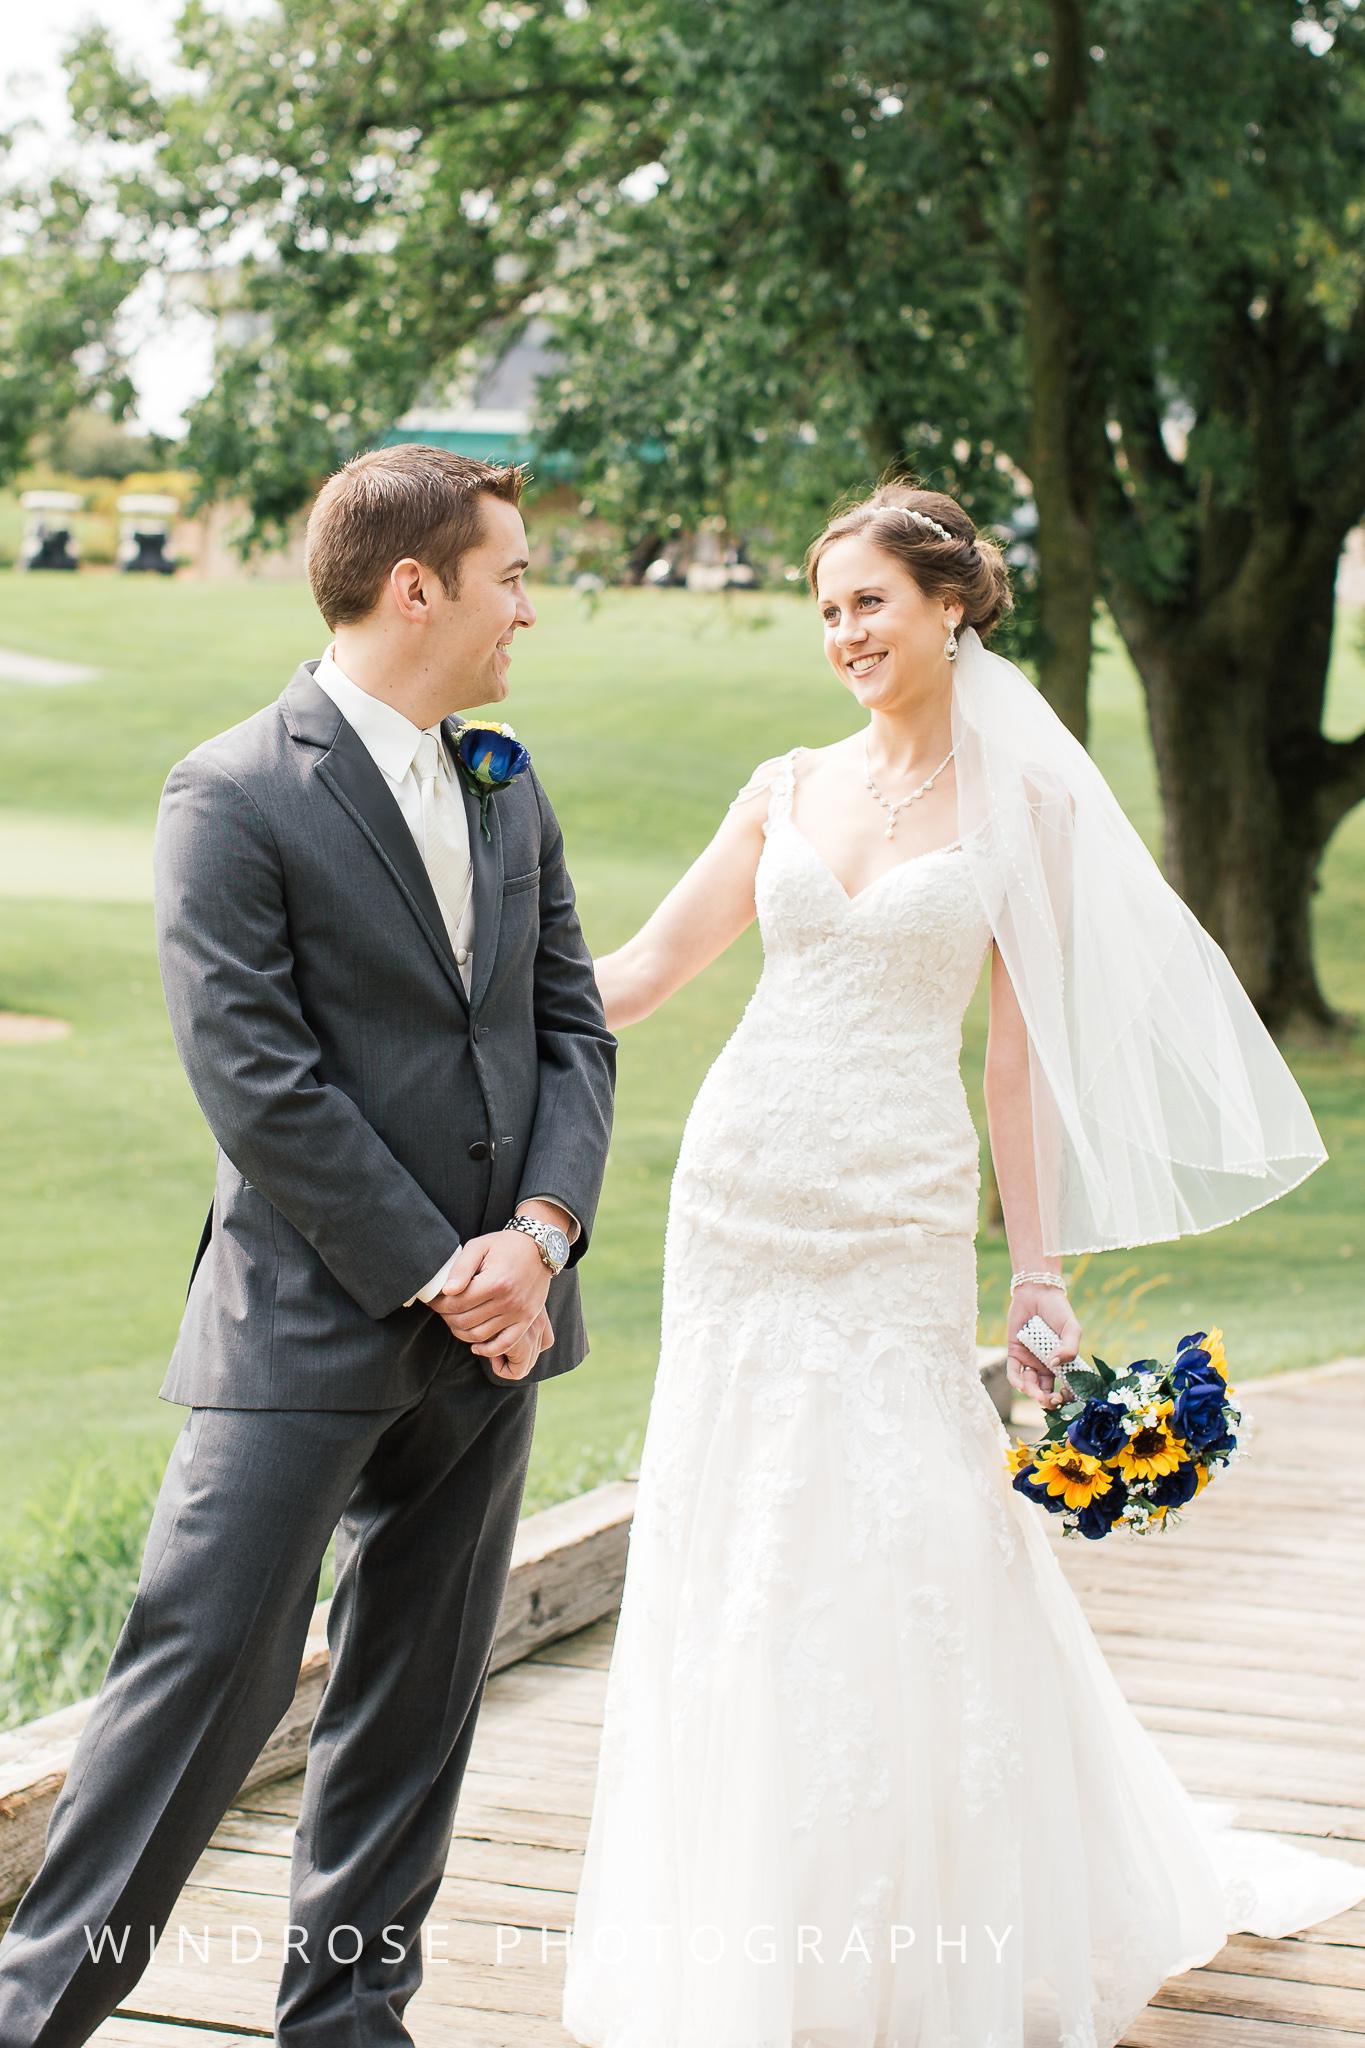 La-Crosse-Country-Club-Wedding-Minnesota-Wedding-Photographer-4.jpg